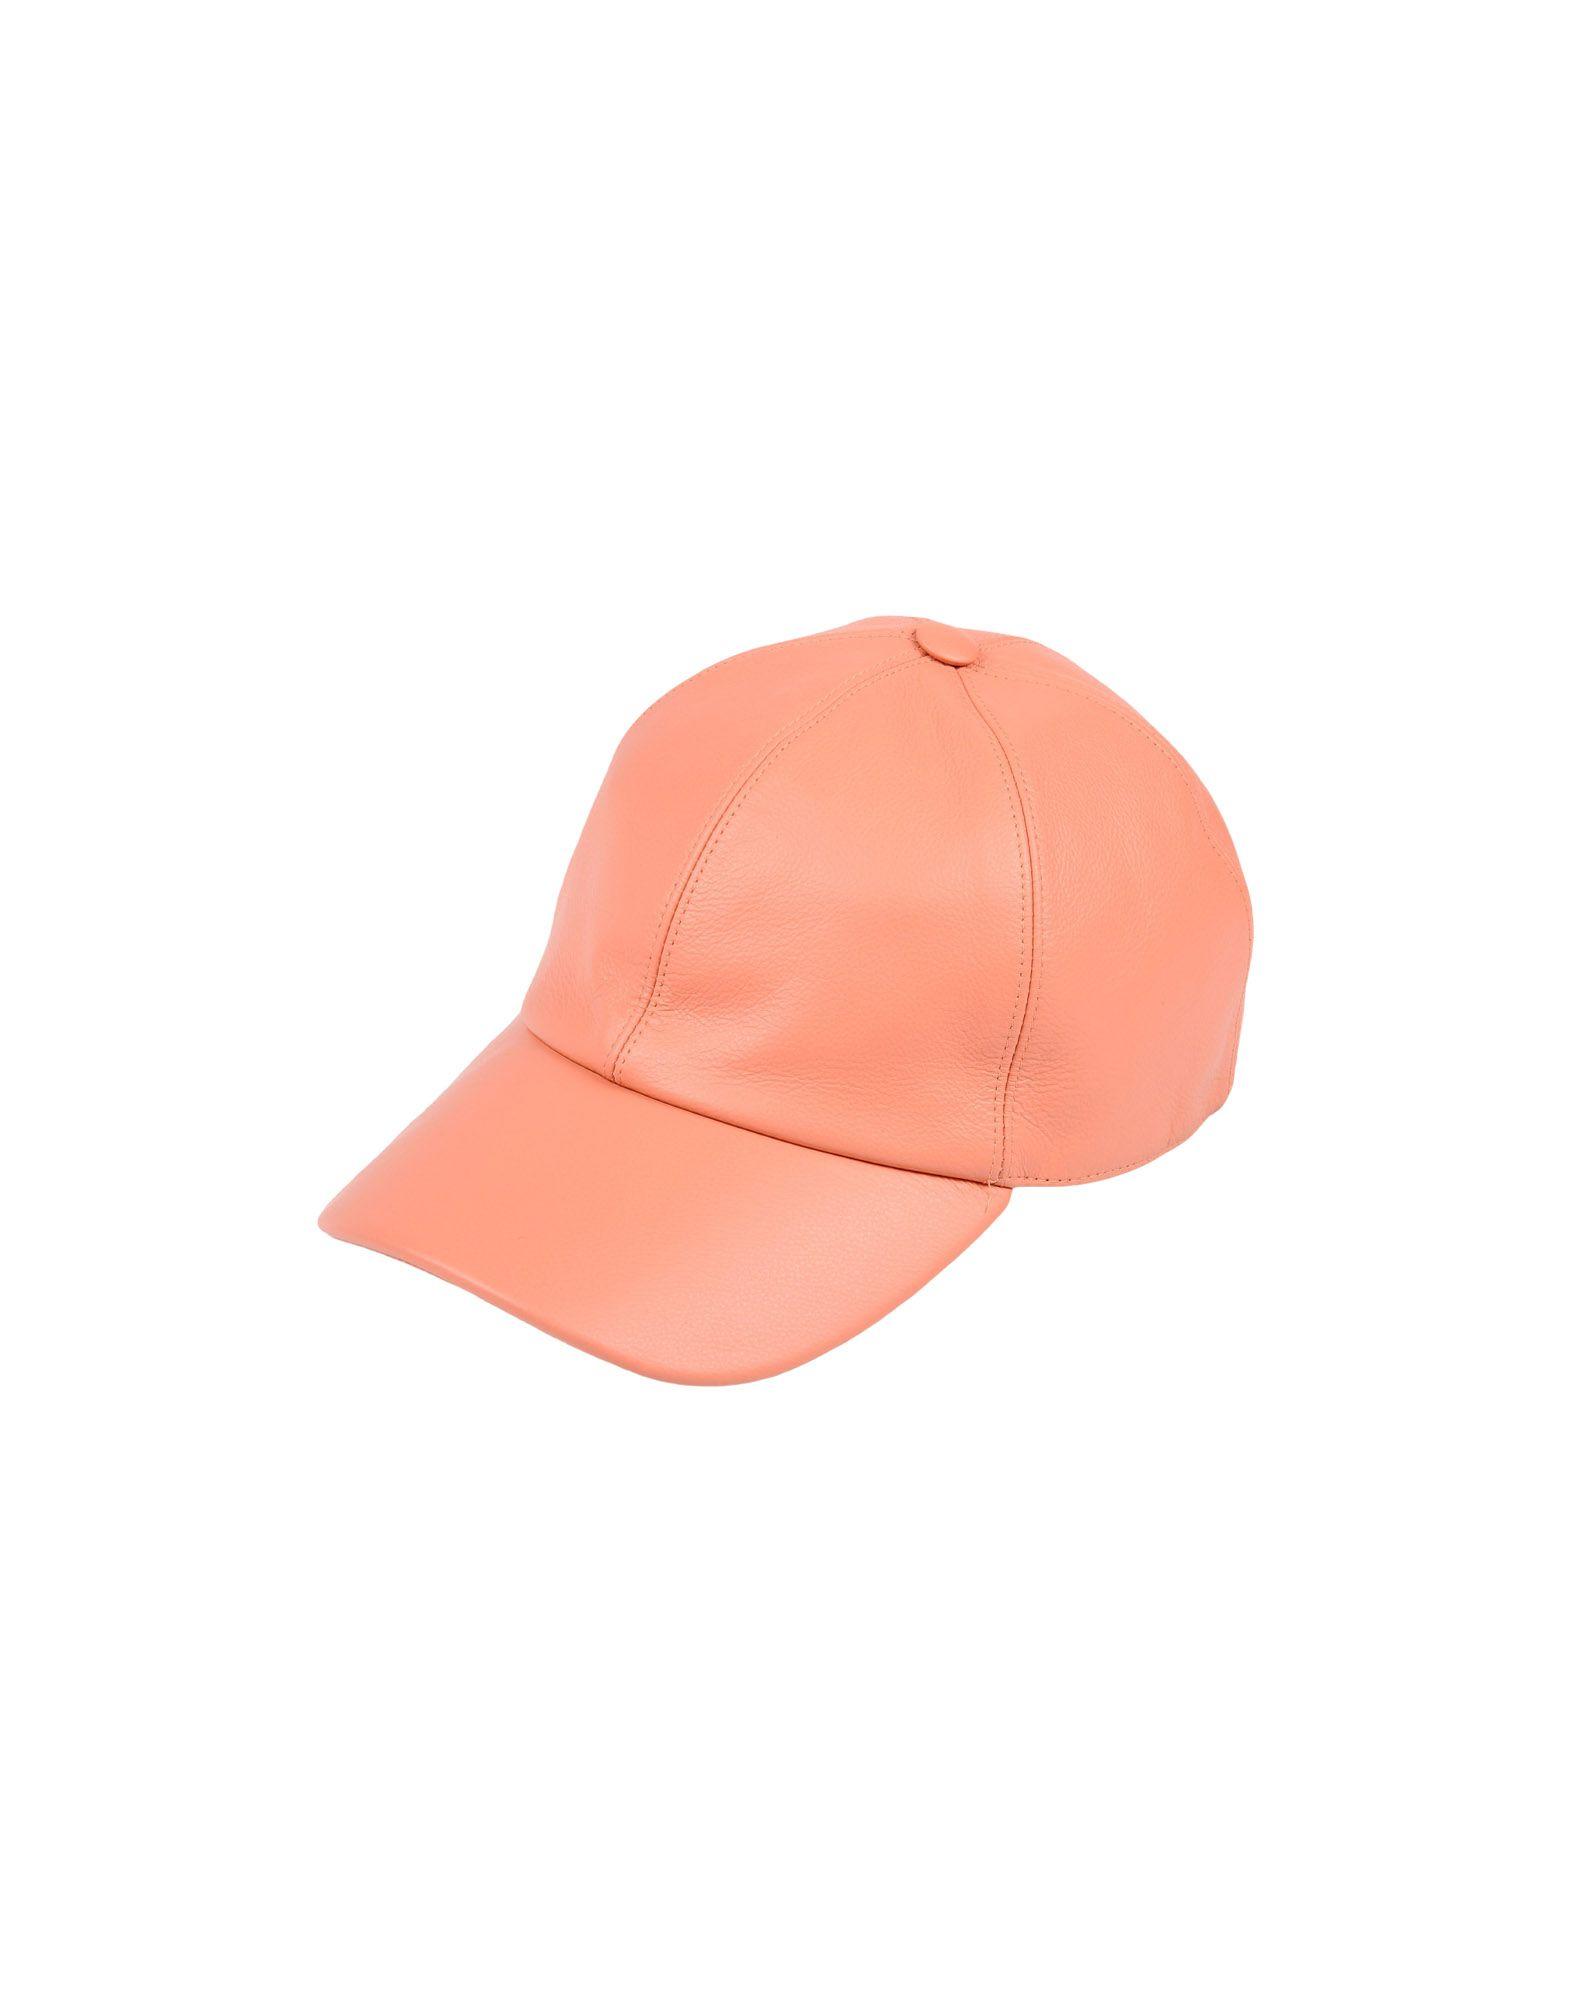 Cappello Umit Benan Donna - Acquista online su